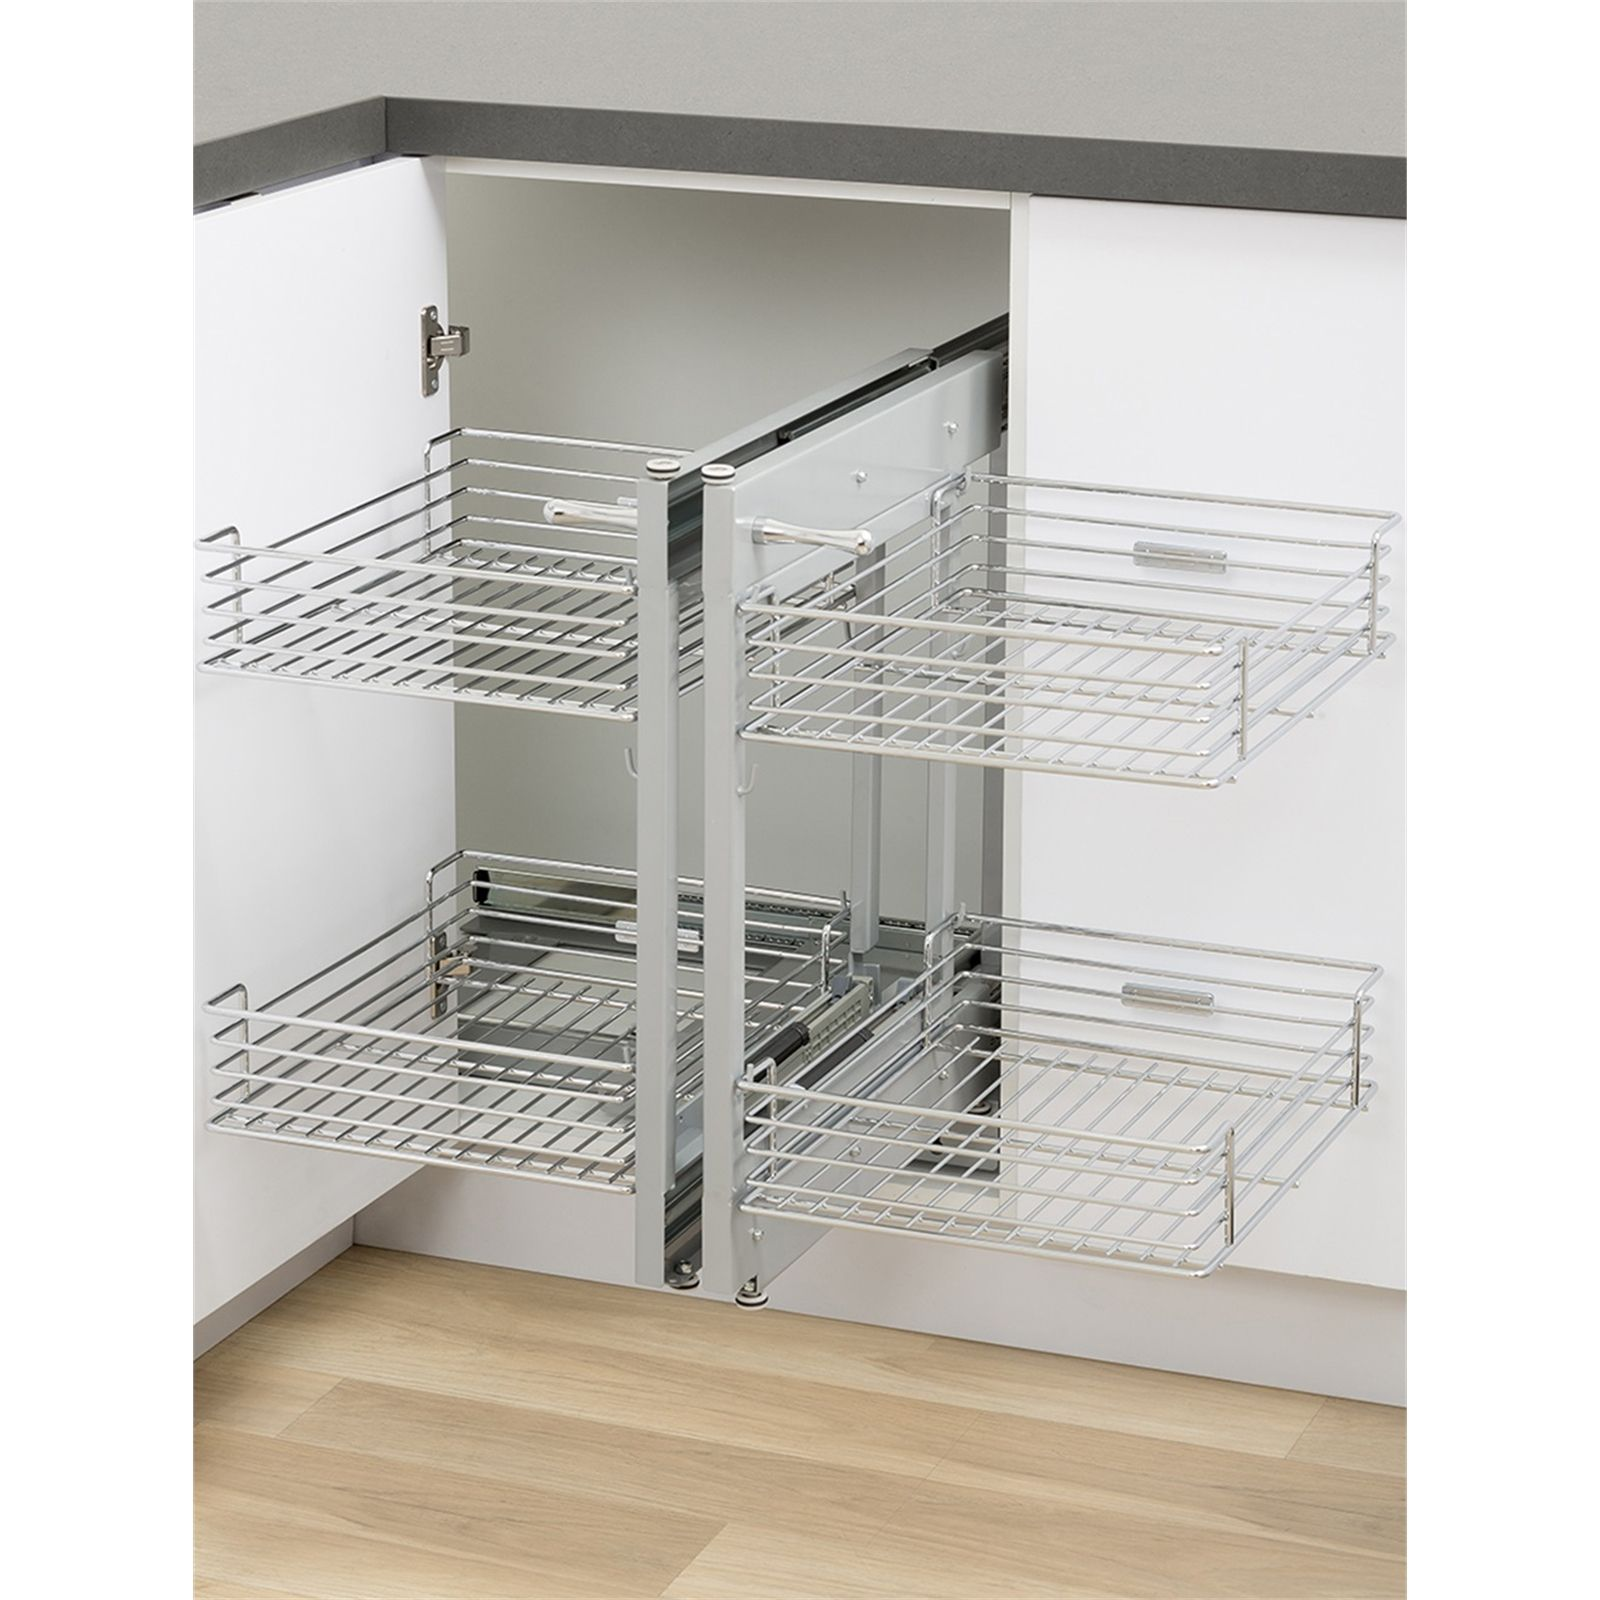 kaboodle 2 tier blind corner soft close pullout baskets corner pantry kaboodle kitchen on kaboodle kitchen storage id=64846